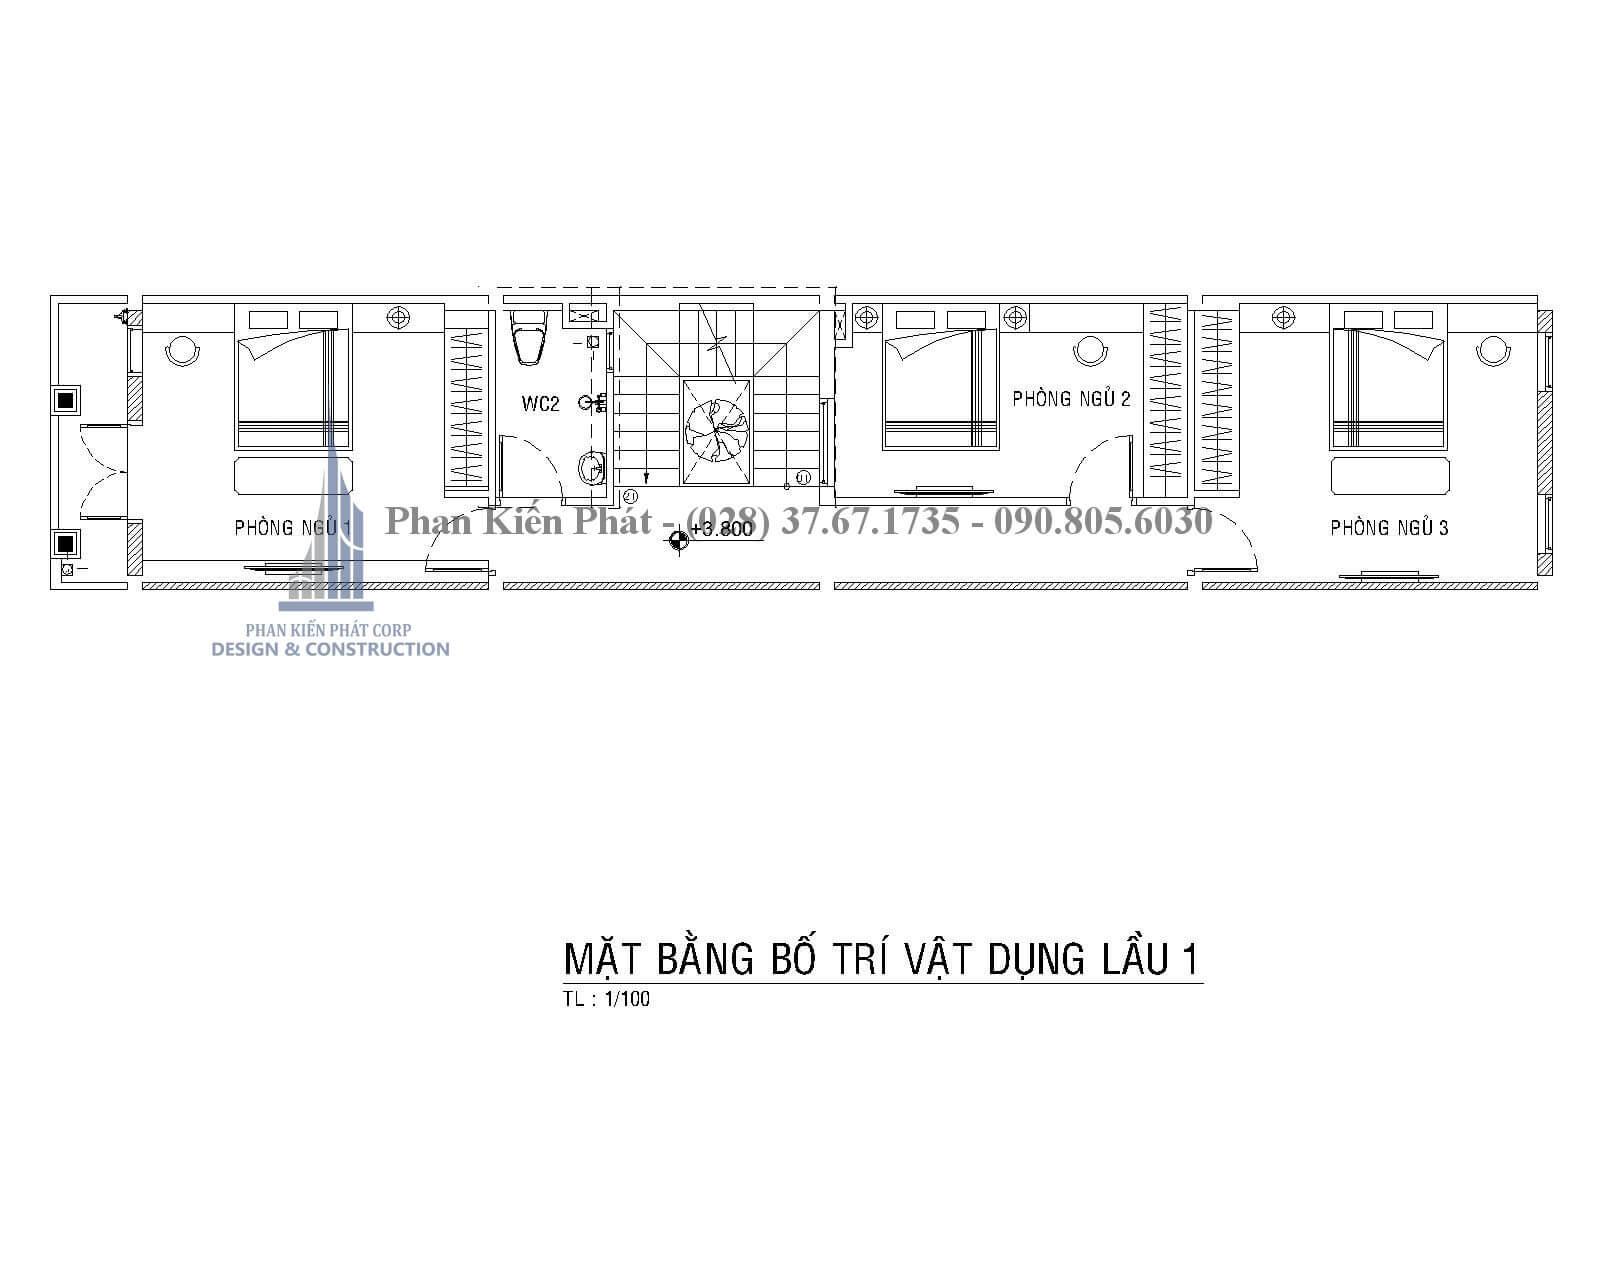 Thiet Ke Xay Dung Nha Dep Mat Bang Lau 1 Nha Pho Mai Thai - mẫu nhà phố 3 tầng tân cổ điển